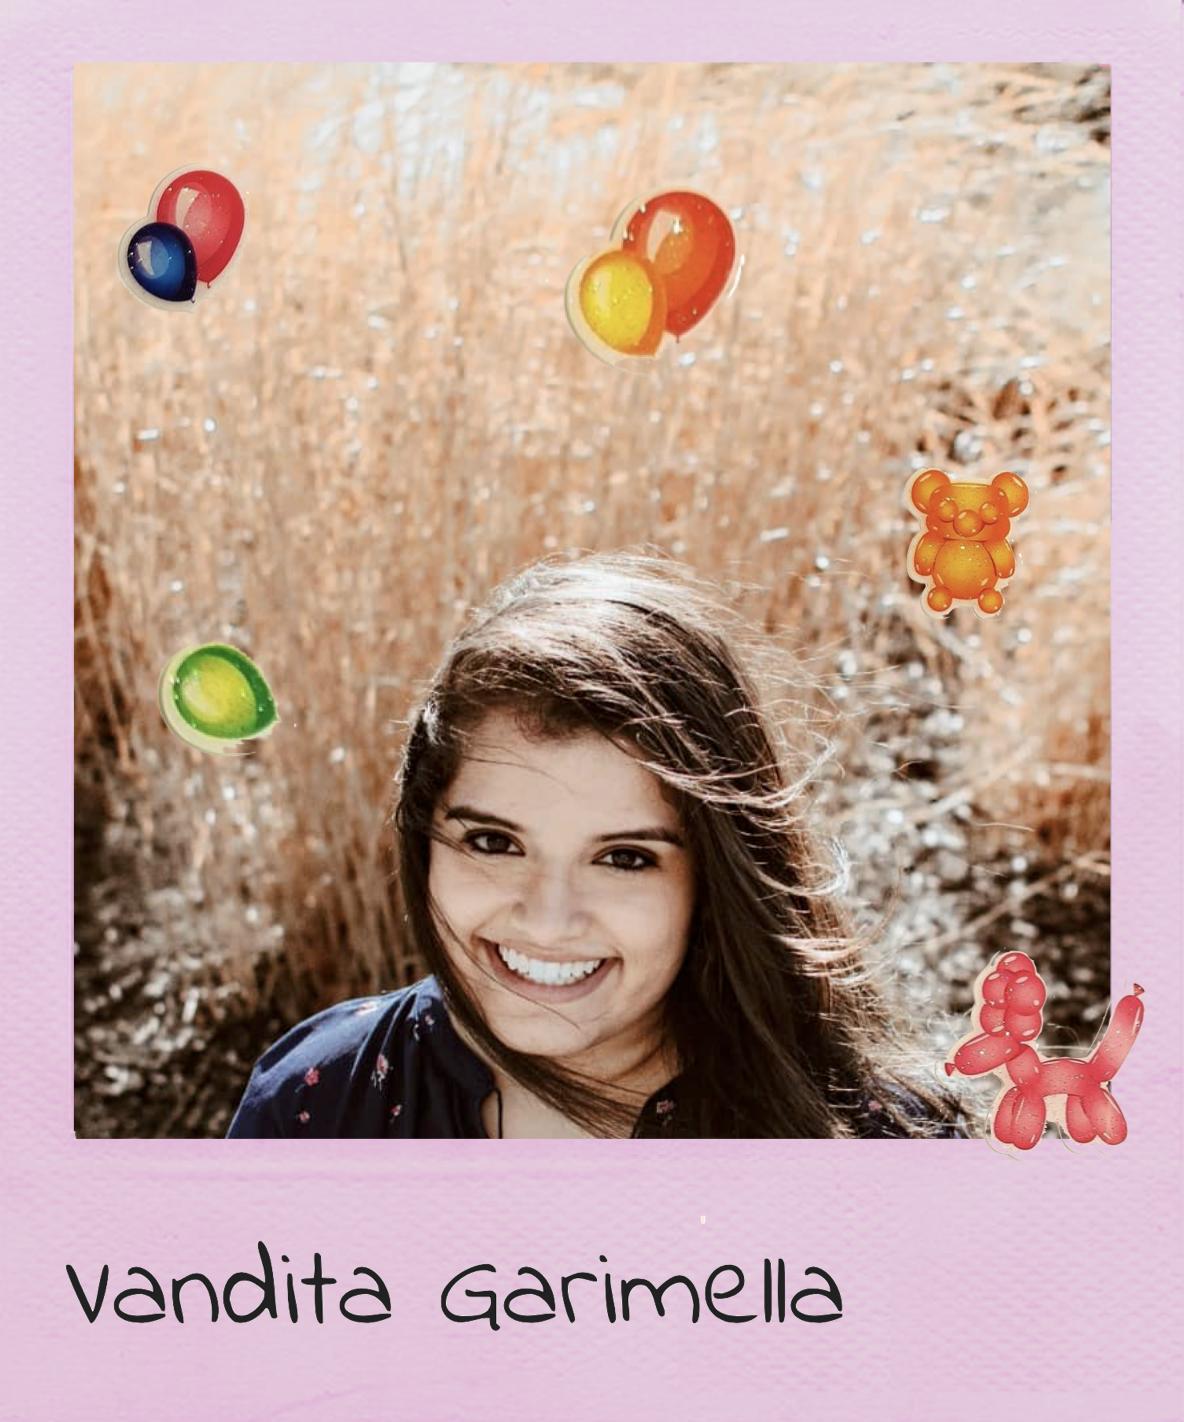 Vandita Garimella .png